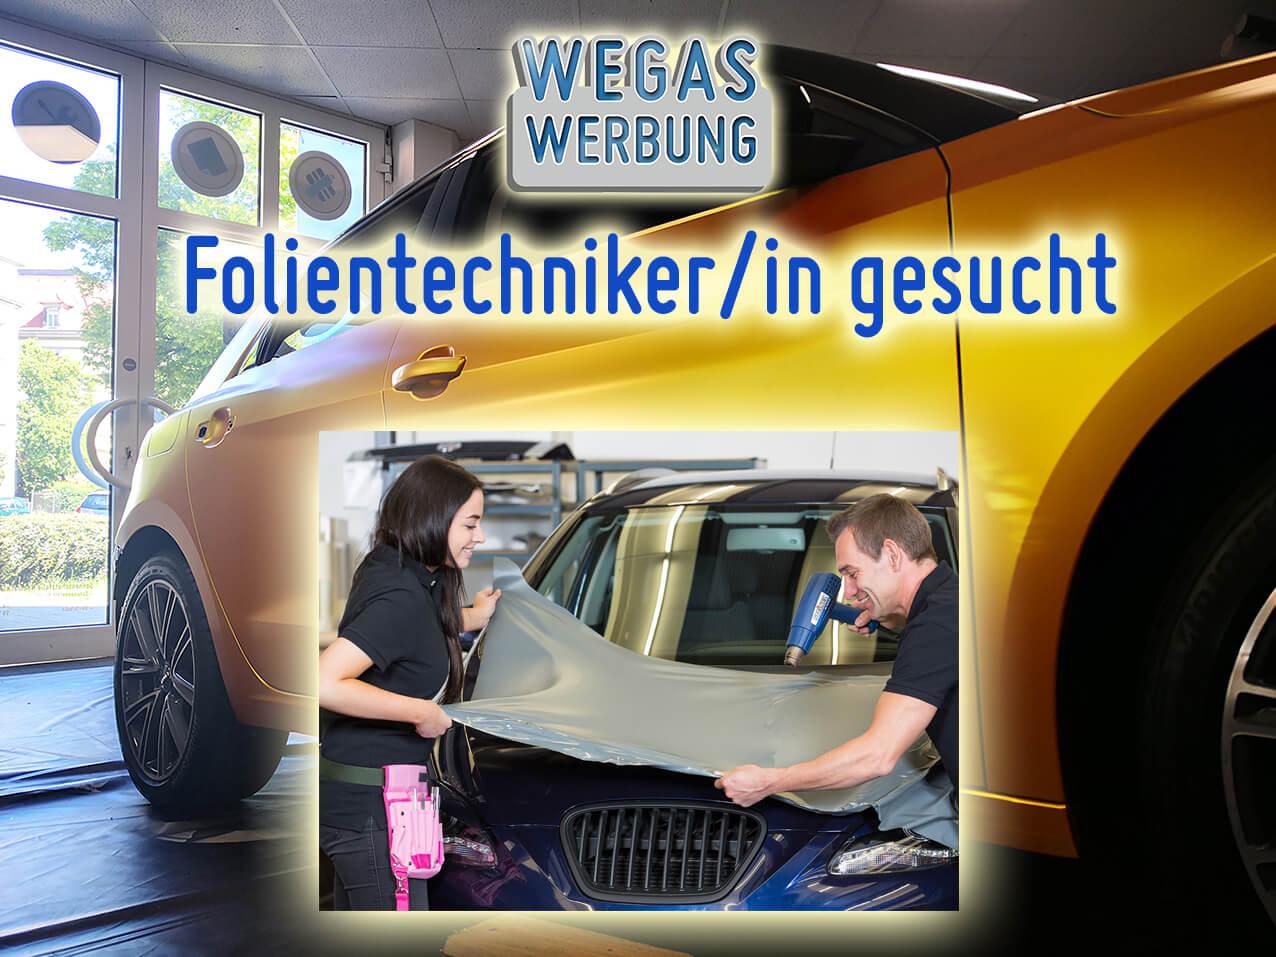 Wegaswerbung-sucht-Monteur-in-Folientechniker-in-Dresden-ab-sofort